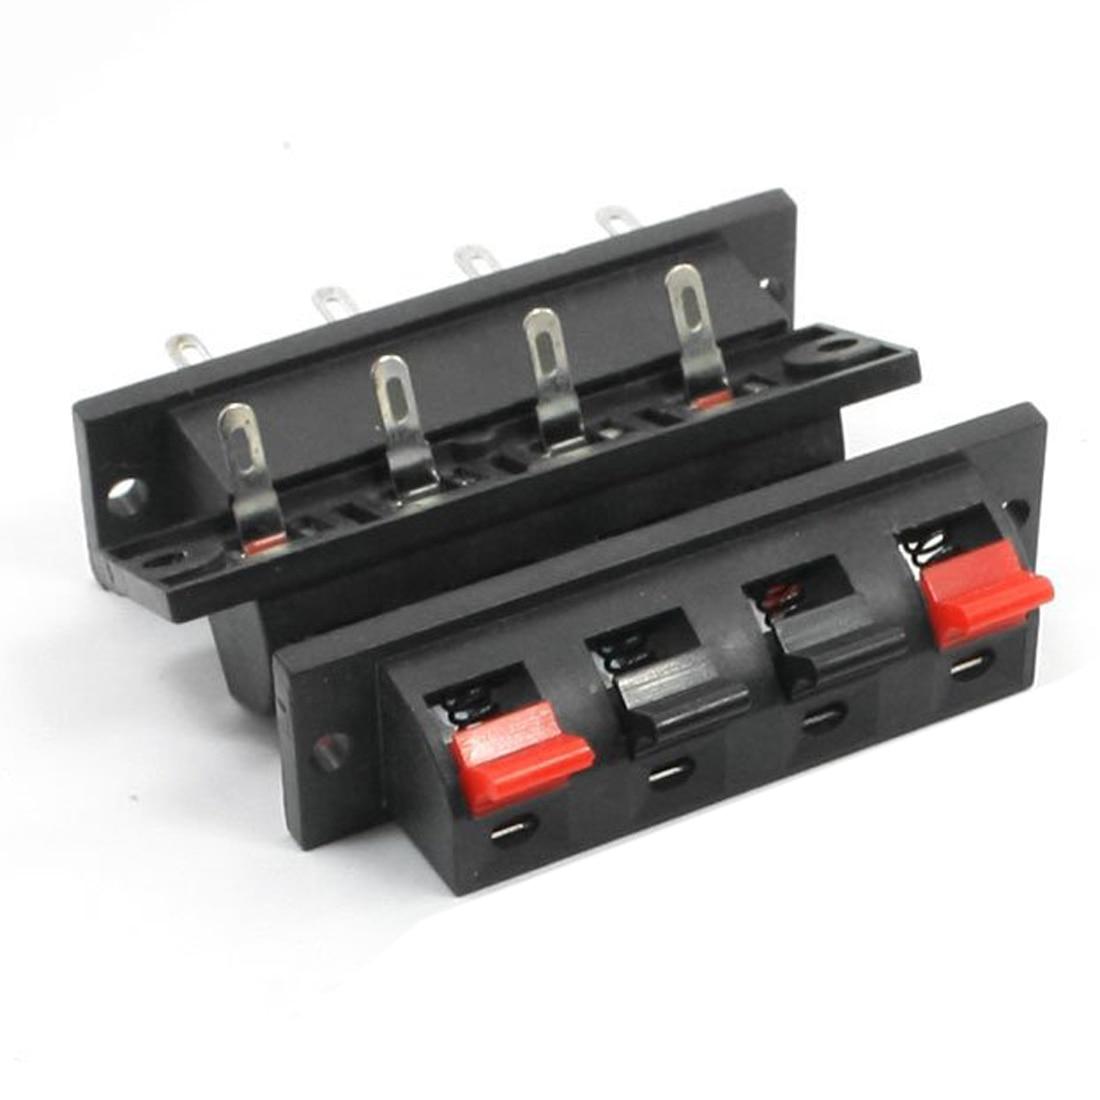 IMC Hot Single Row 4 Pin 4 Position Speaker Terminal Board Connectors 5 Pcs компьютерные аксессуары imc 27g 4 mainboard i006965